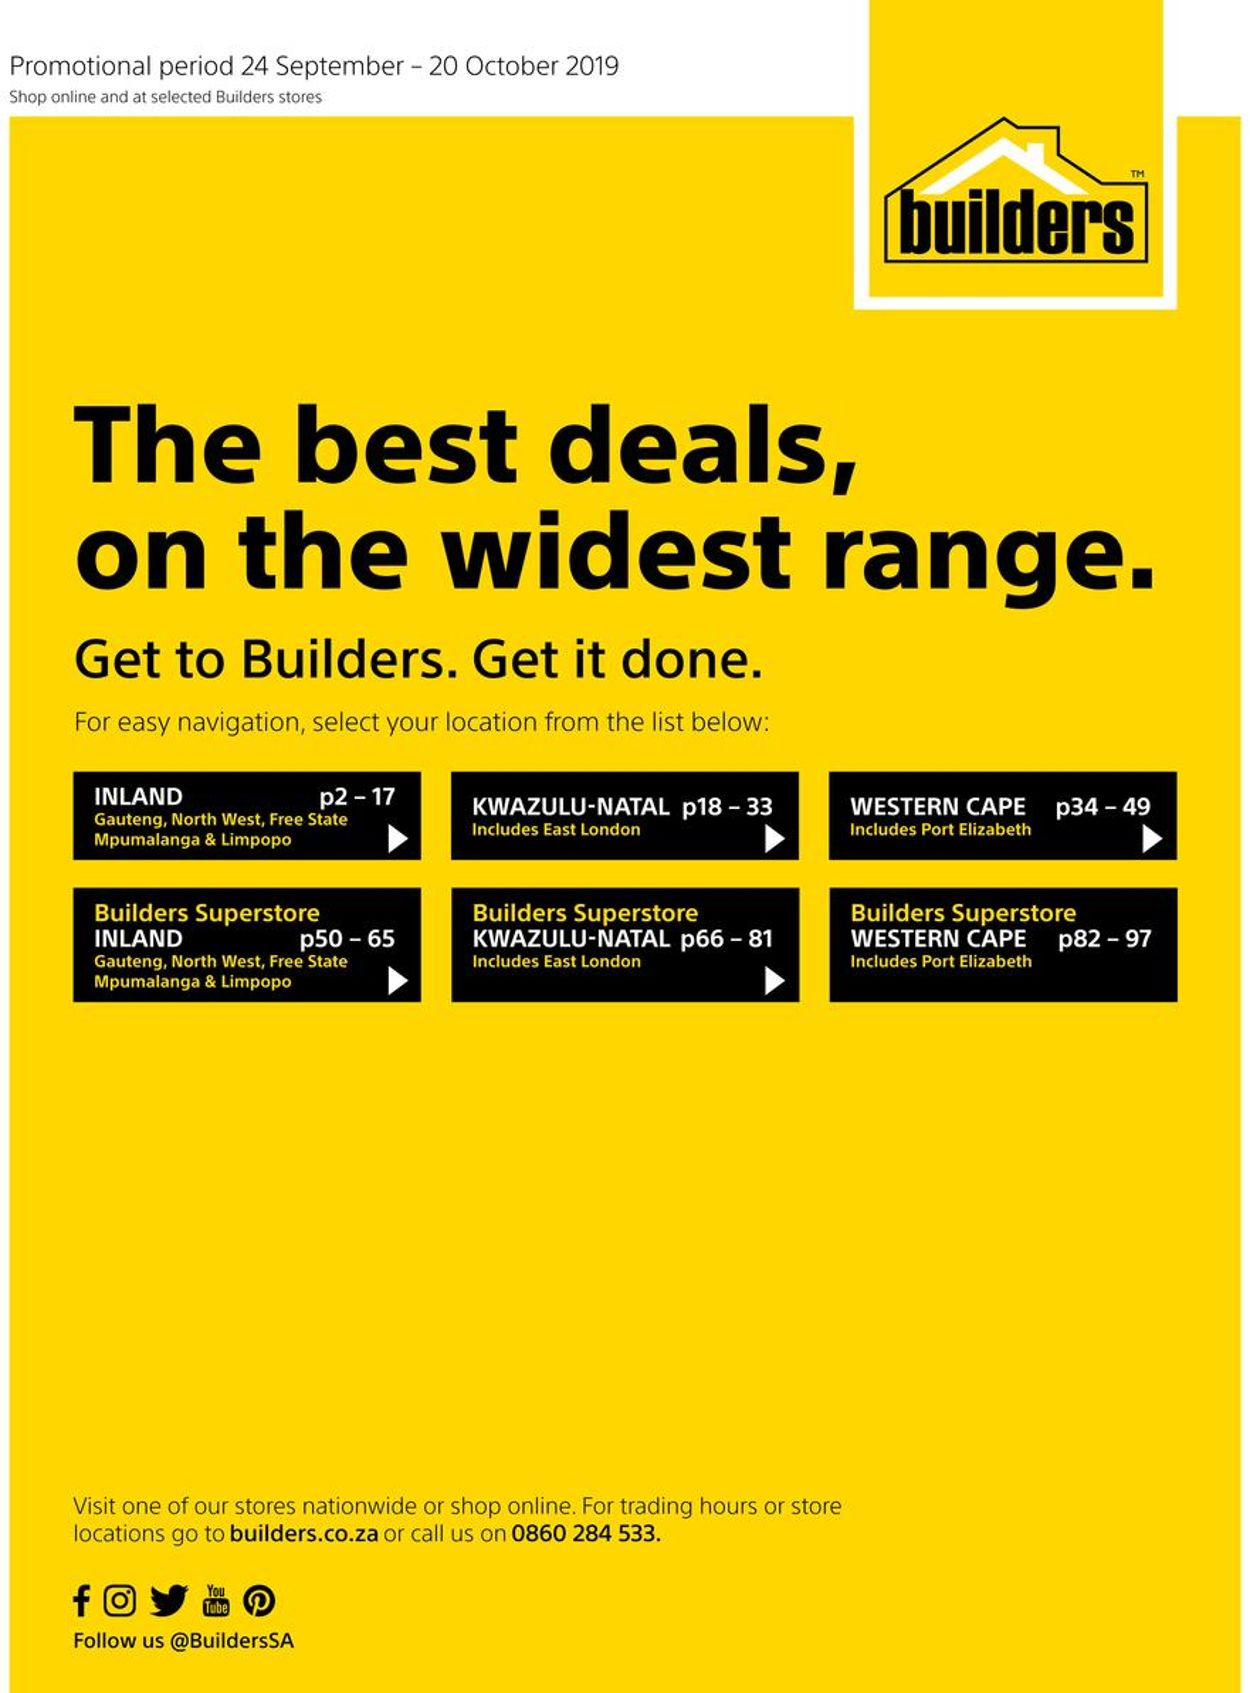 Builders Warehouse Catalogue - 2019/09/24-2019/10/20